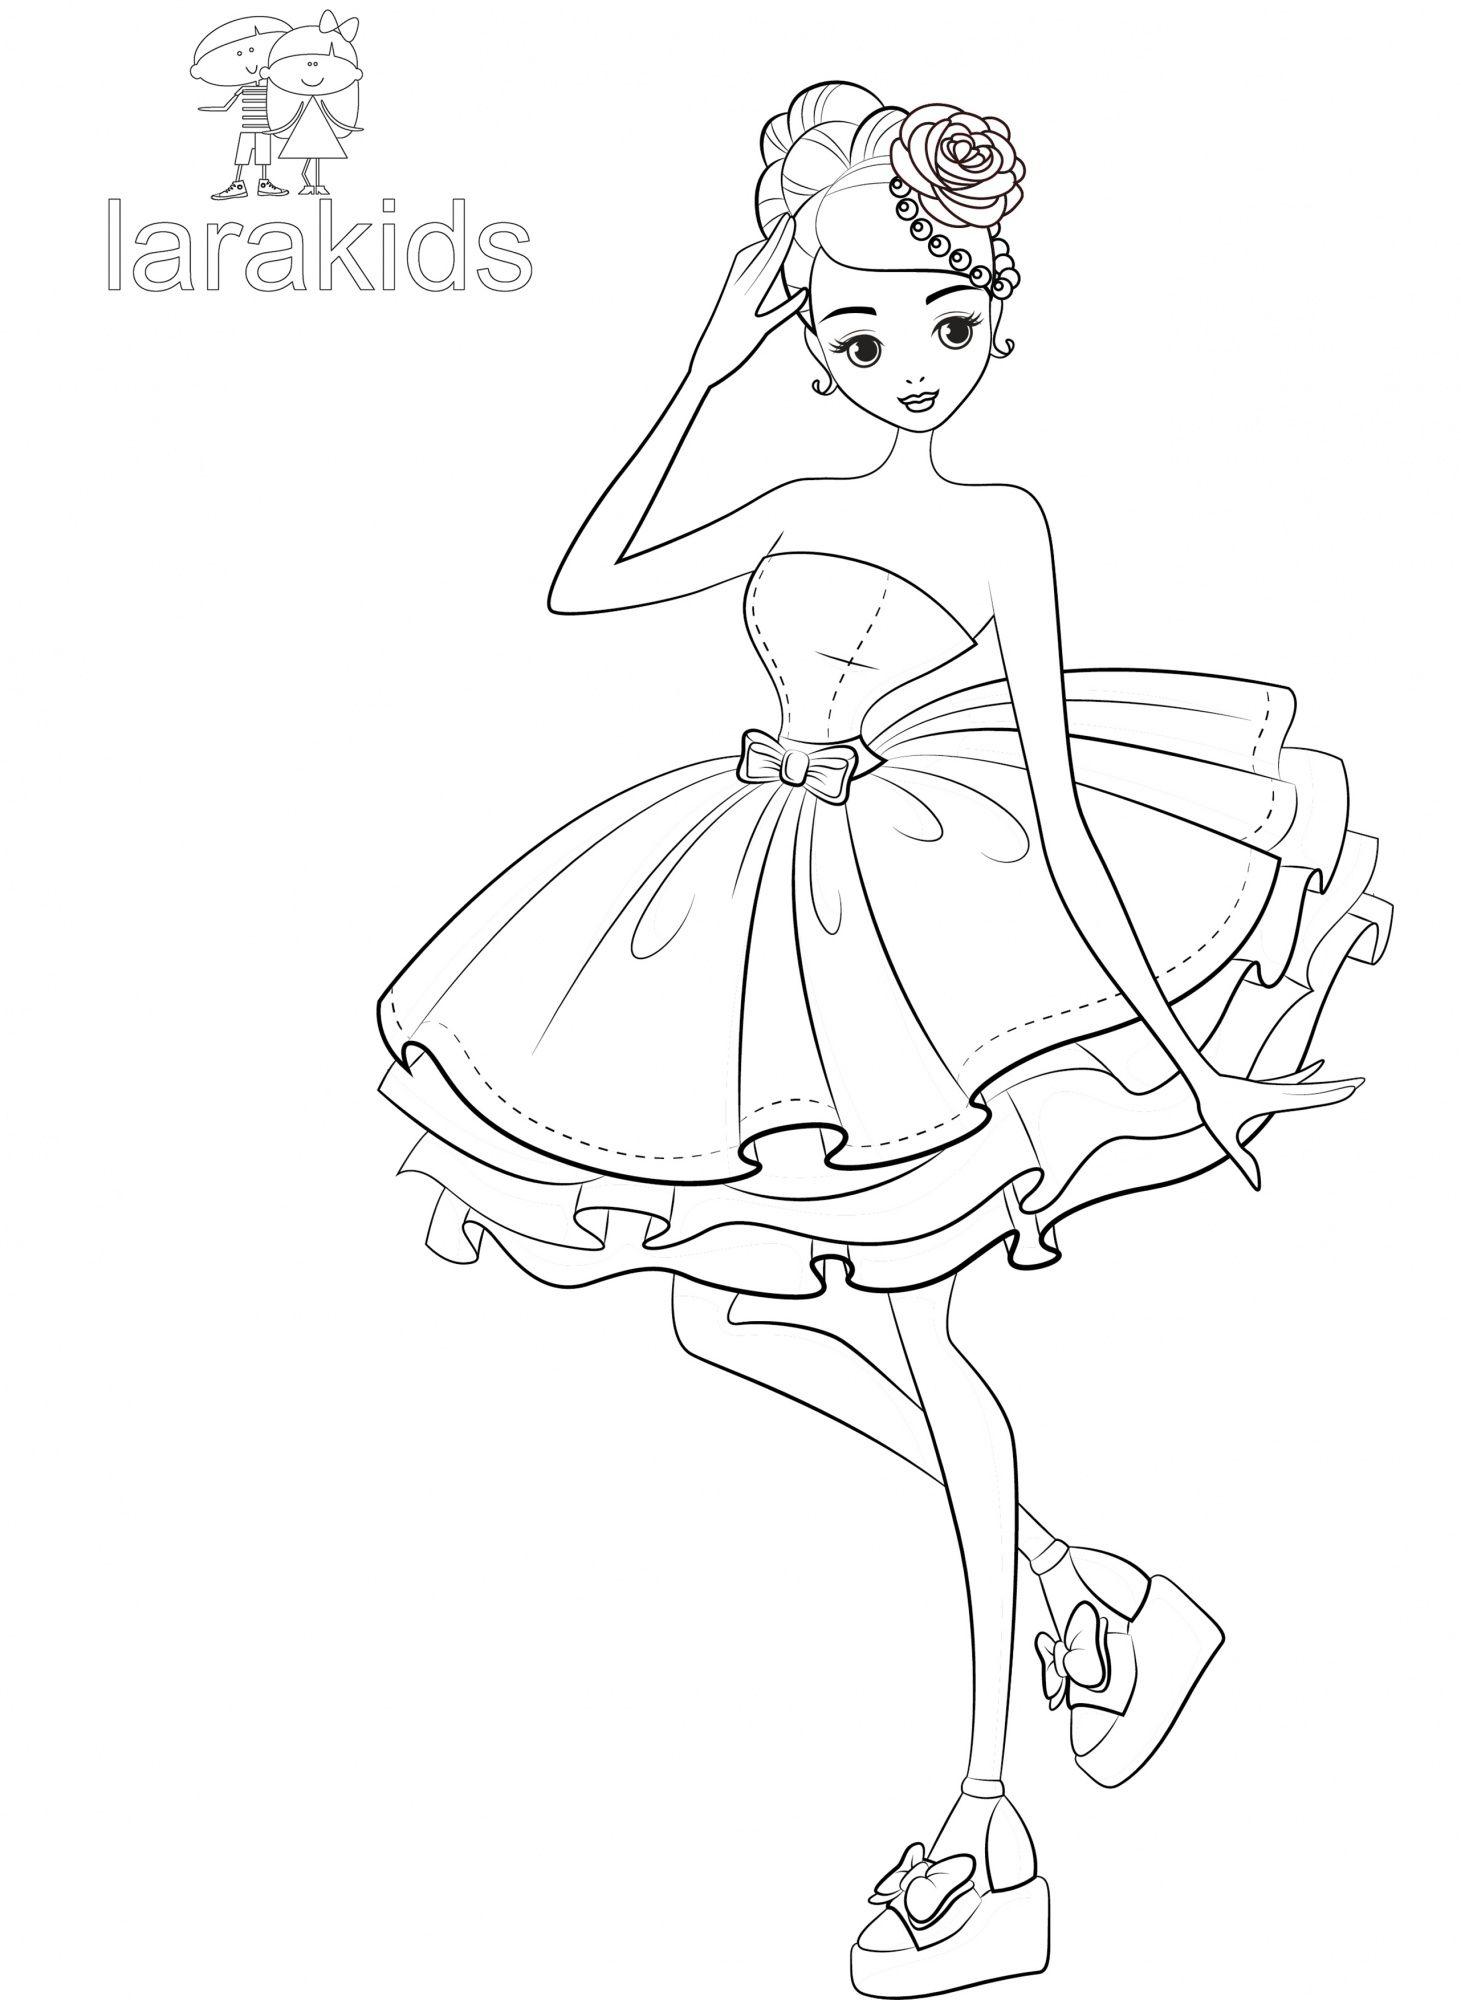 Ausmalbilder Topmodel Meerjungfrau : Drucken F Rbung Sonia Rose Im Kurzen Kleid Ausmalbilder Topmodel